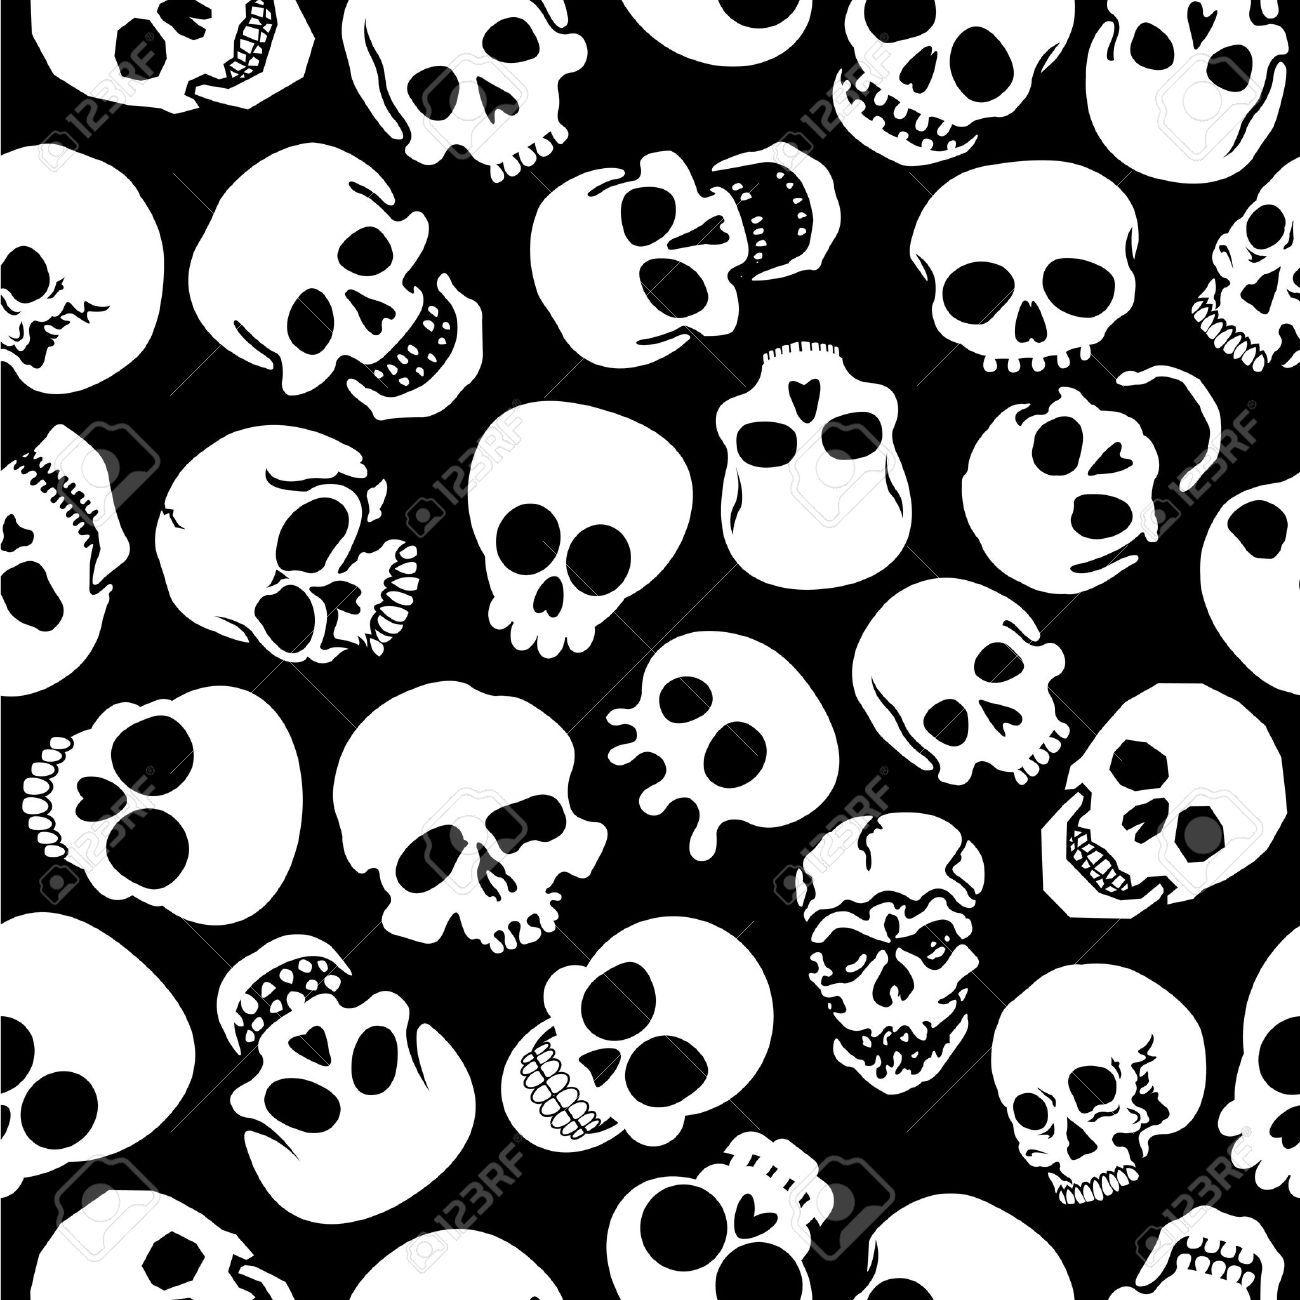 13769462-Skulls-in-Black-Background-Seamless-Pattern-Stock-Vector-skulls-halloween-zombie.jpg (1300×1300)